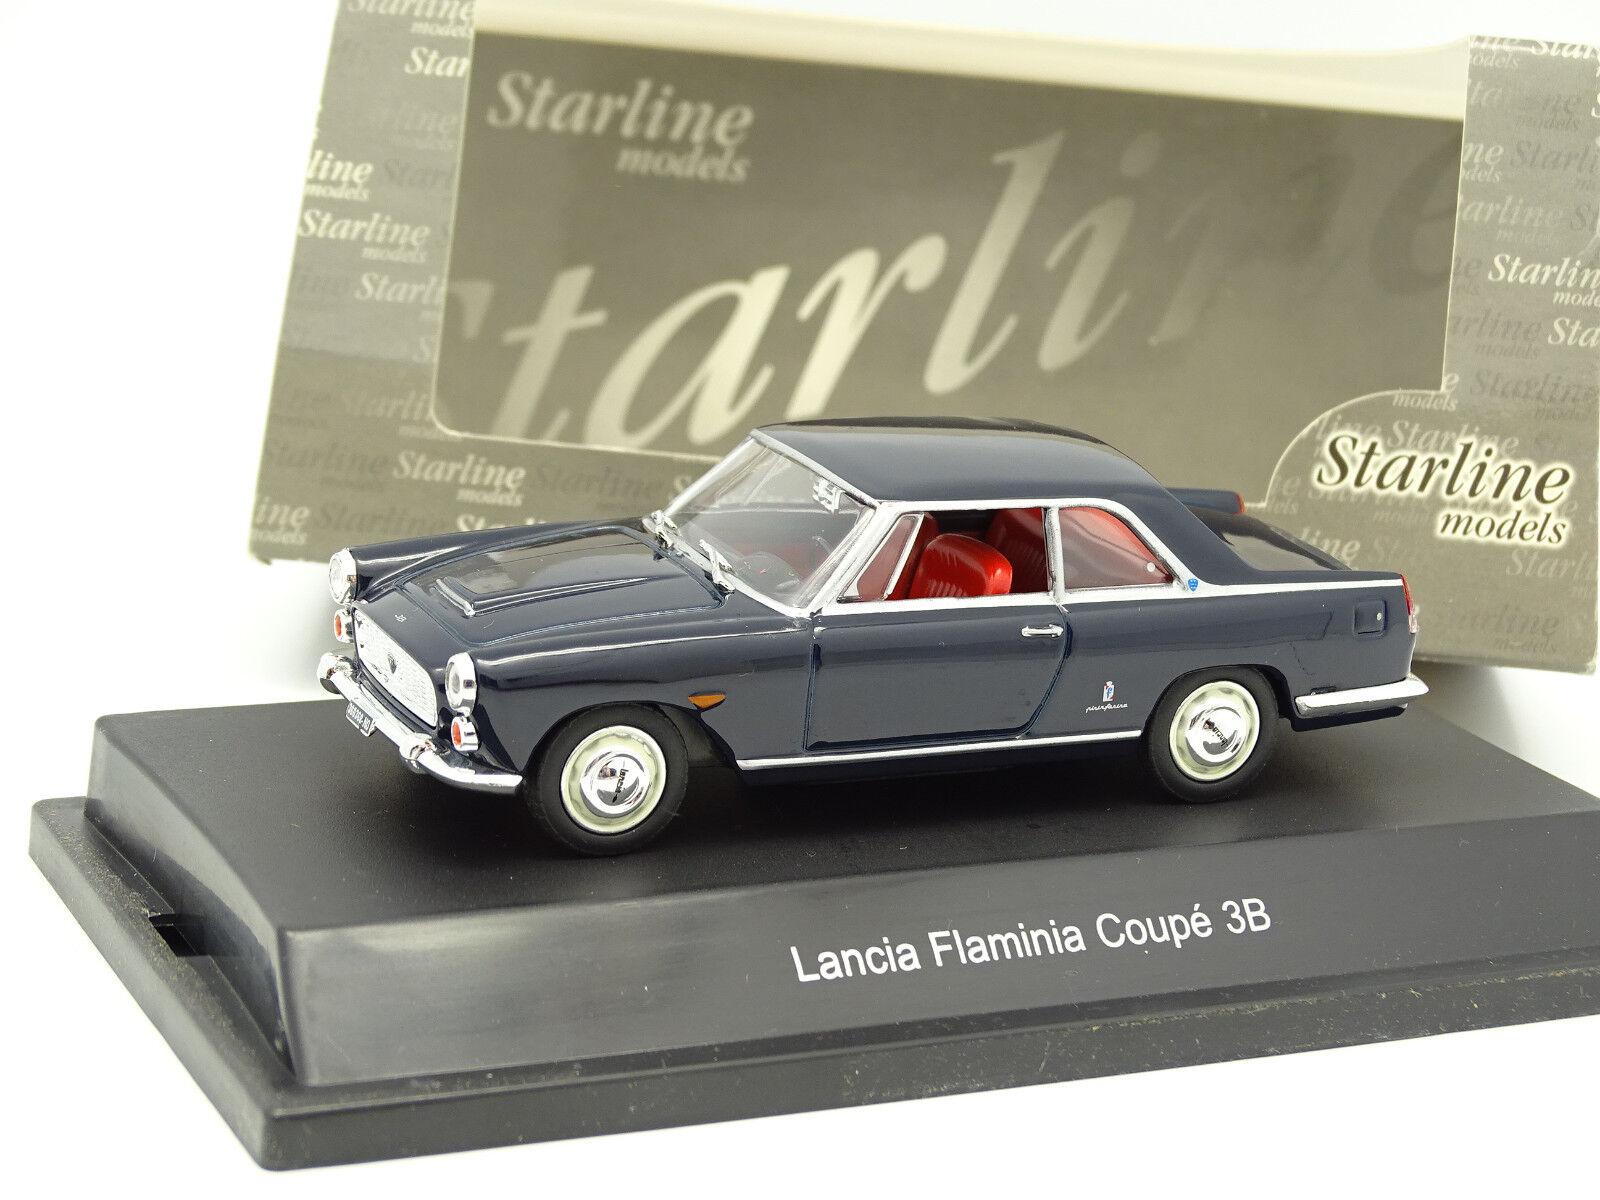 Starline 1 43 43 43 - Lancia Flaminia Coupe 3B blue 7ceb6e